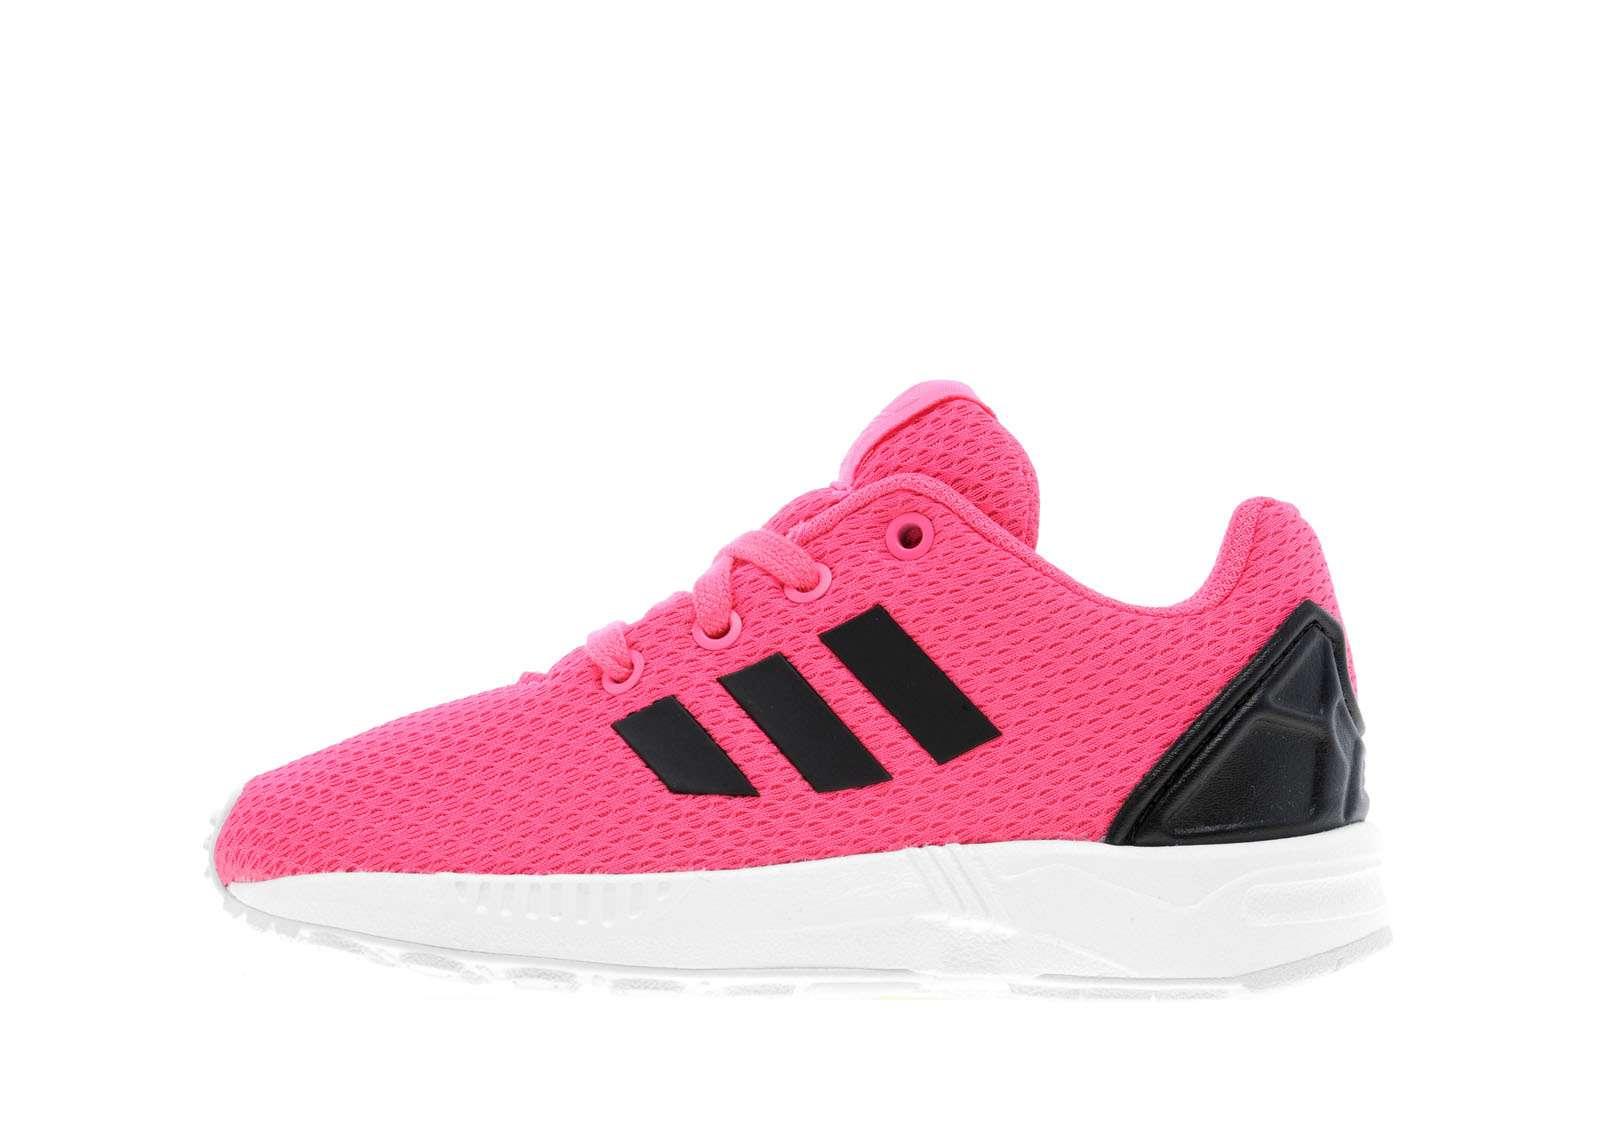 Adidas Originals Bebe Adidas Originals zx Flux